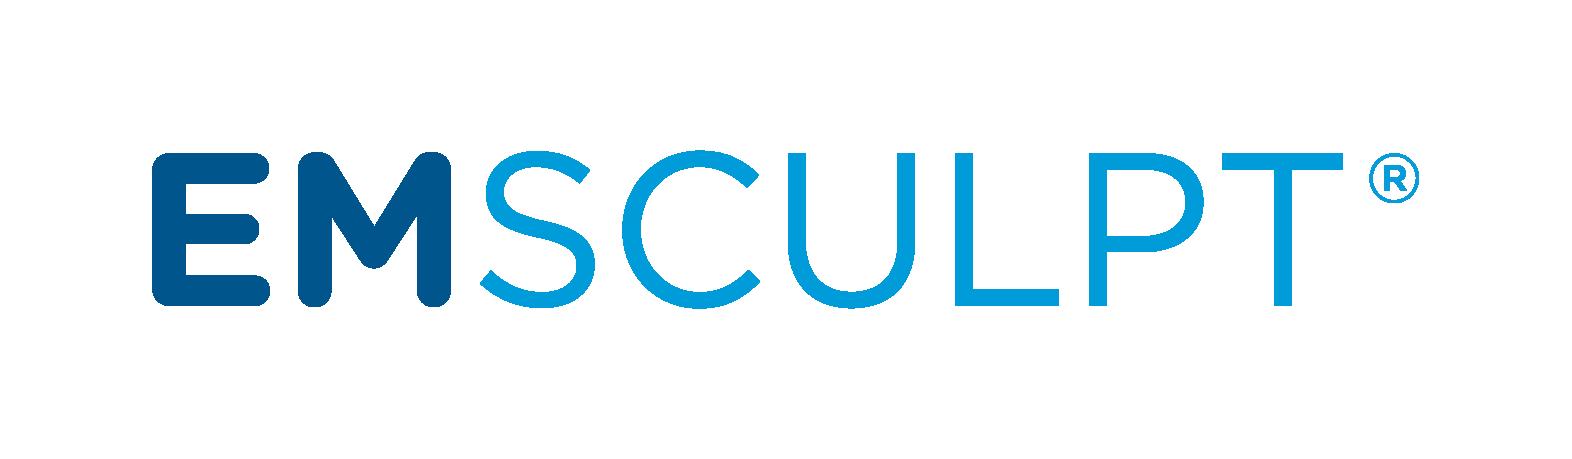 EMSculpt Sculpt Body liveagelessly logo